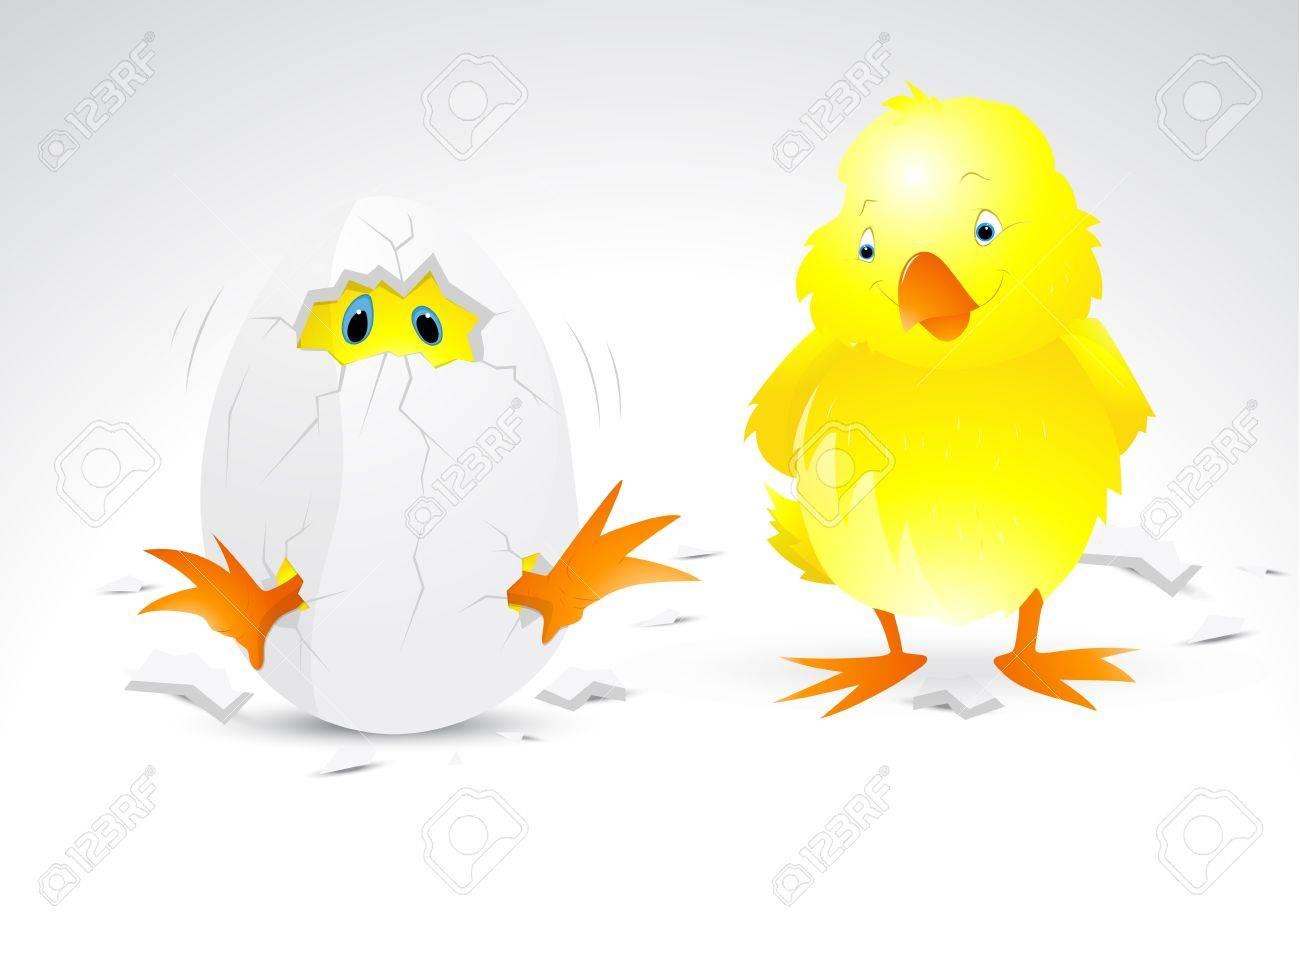 Vector Cartoon Chicken Stock Vector - 12771751